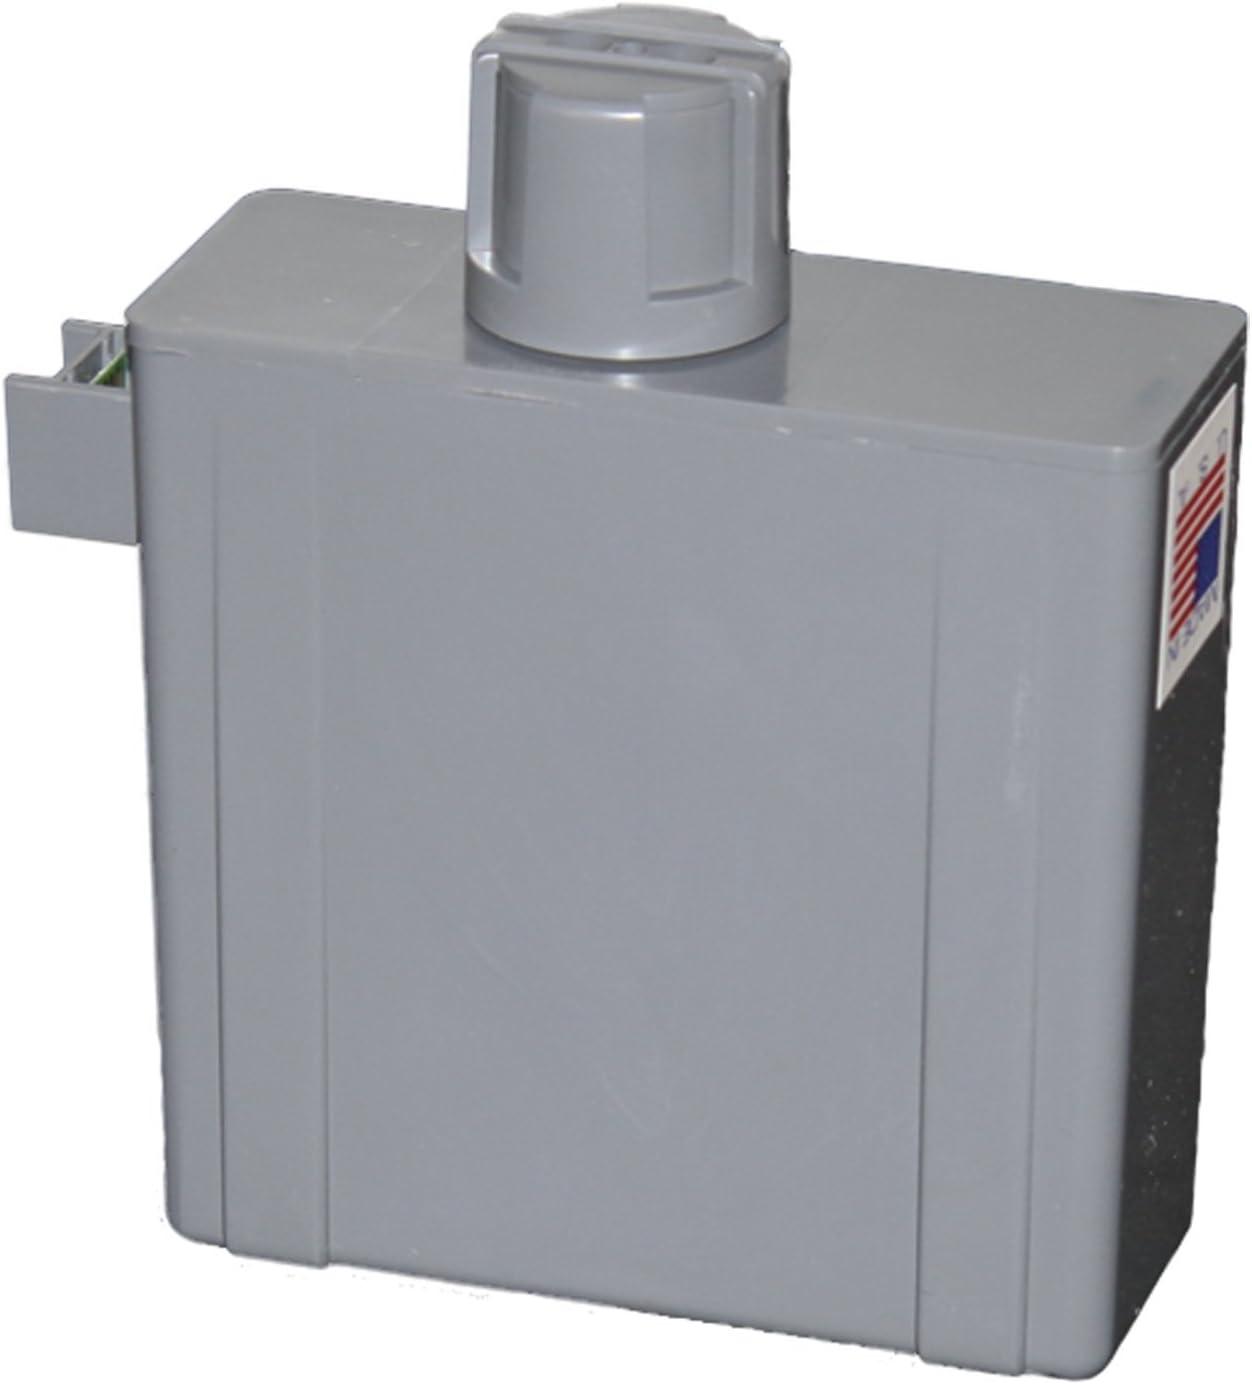 m-inf – Postageメーターインク – 比較に: Pitneyボウズ# 772 – 1 – For use in : Pitneyボウズdm16 K、dm22 K、dm22kr